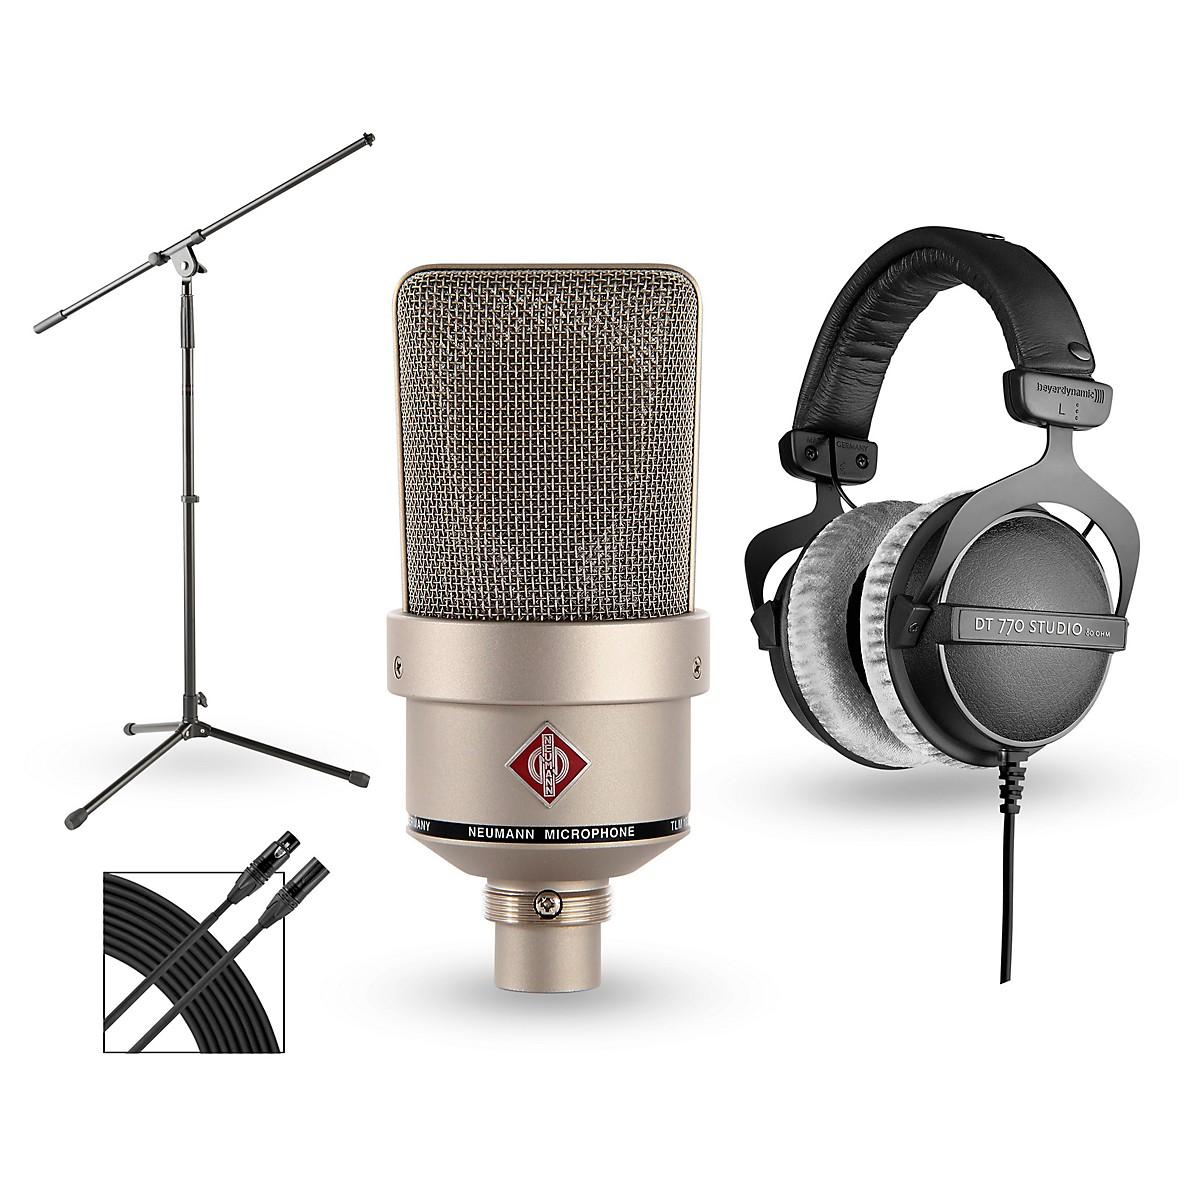 Neumann Choose Your Microphone Bundle